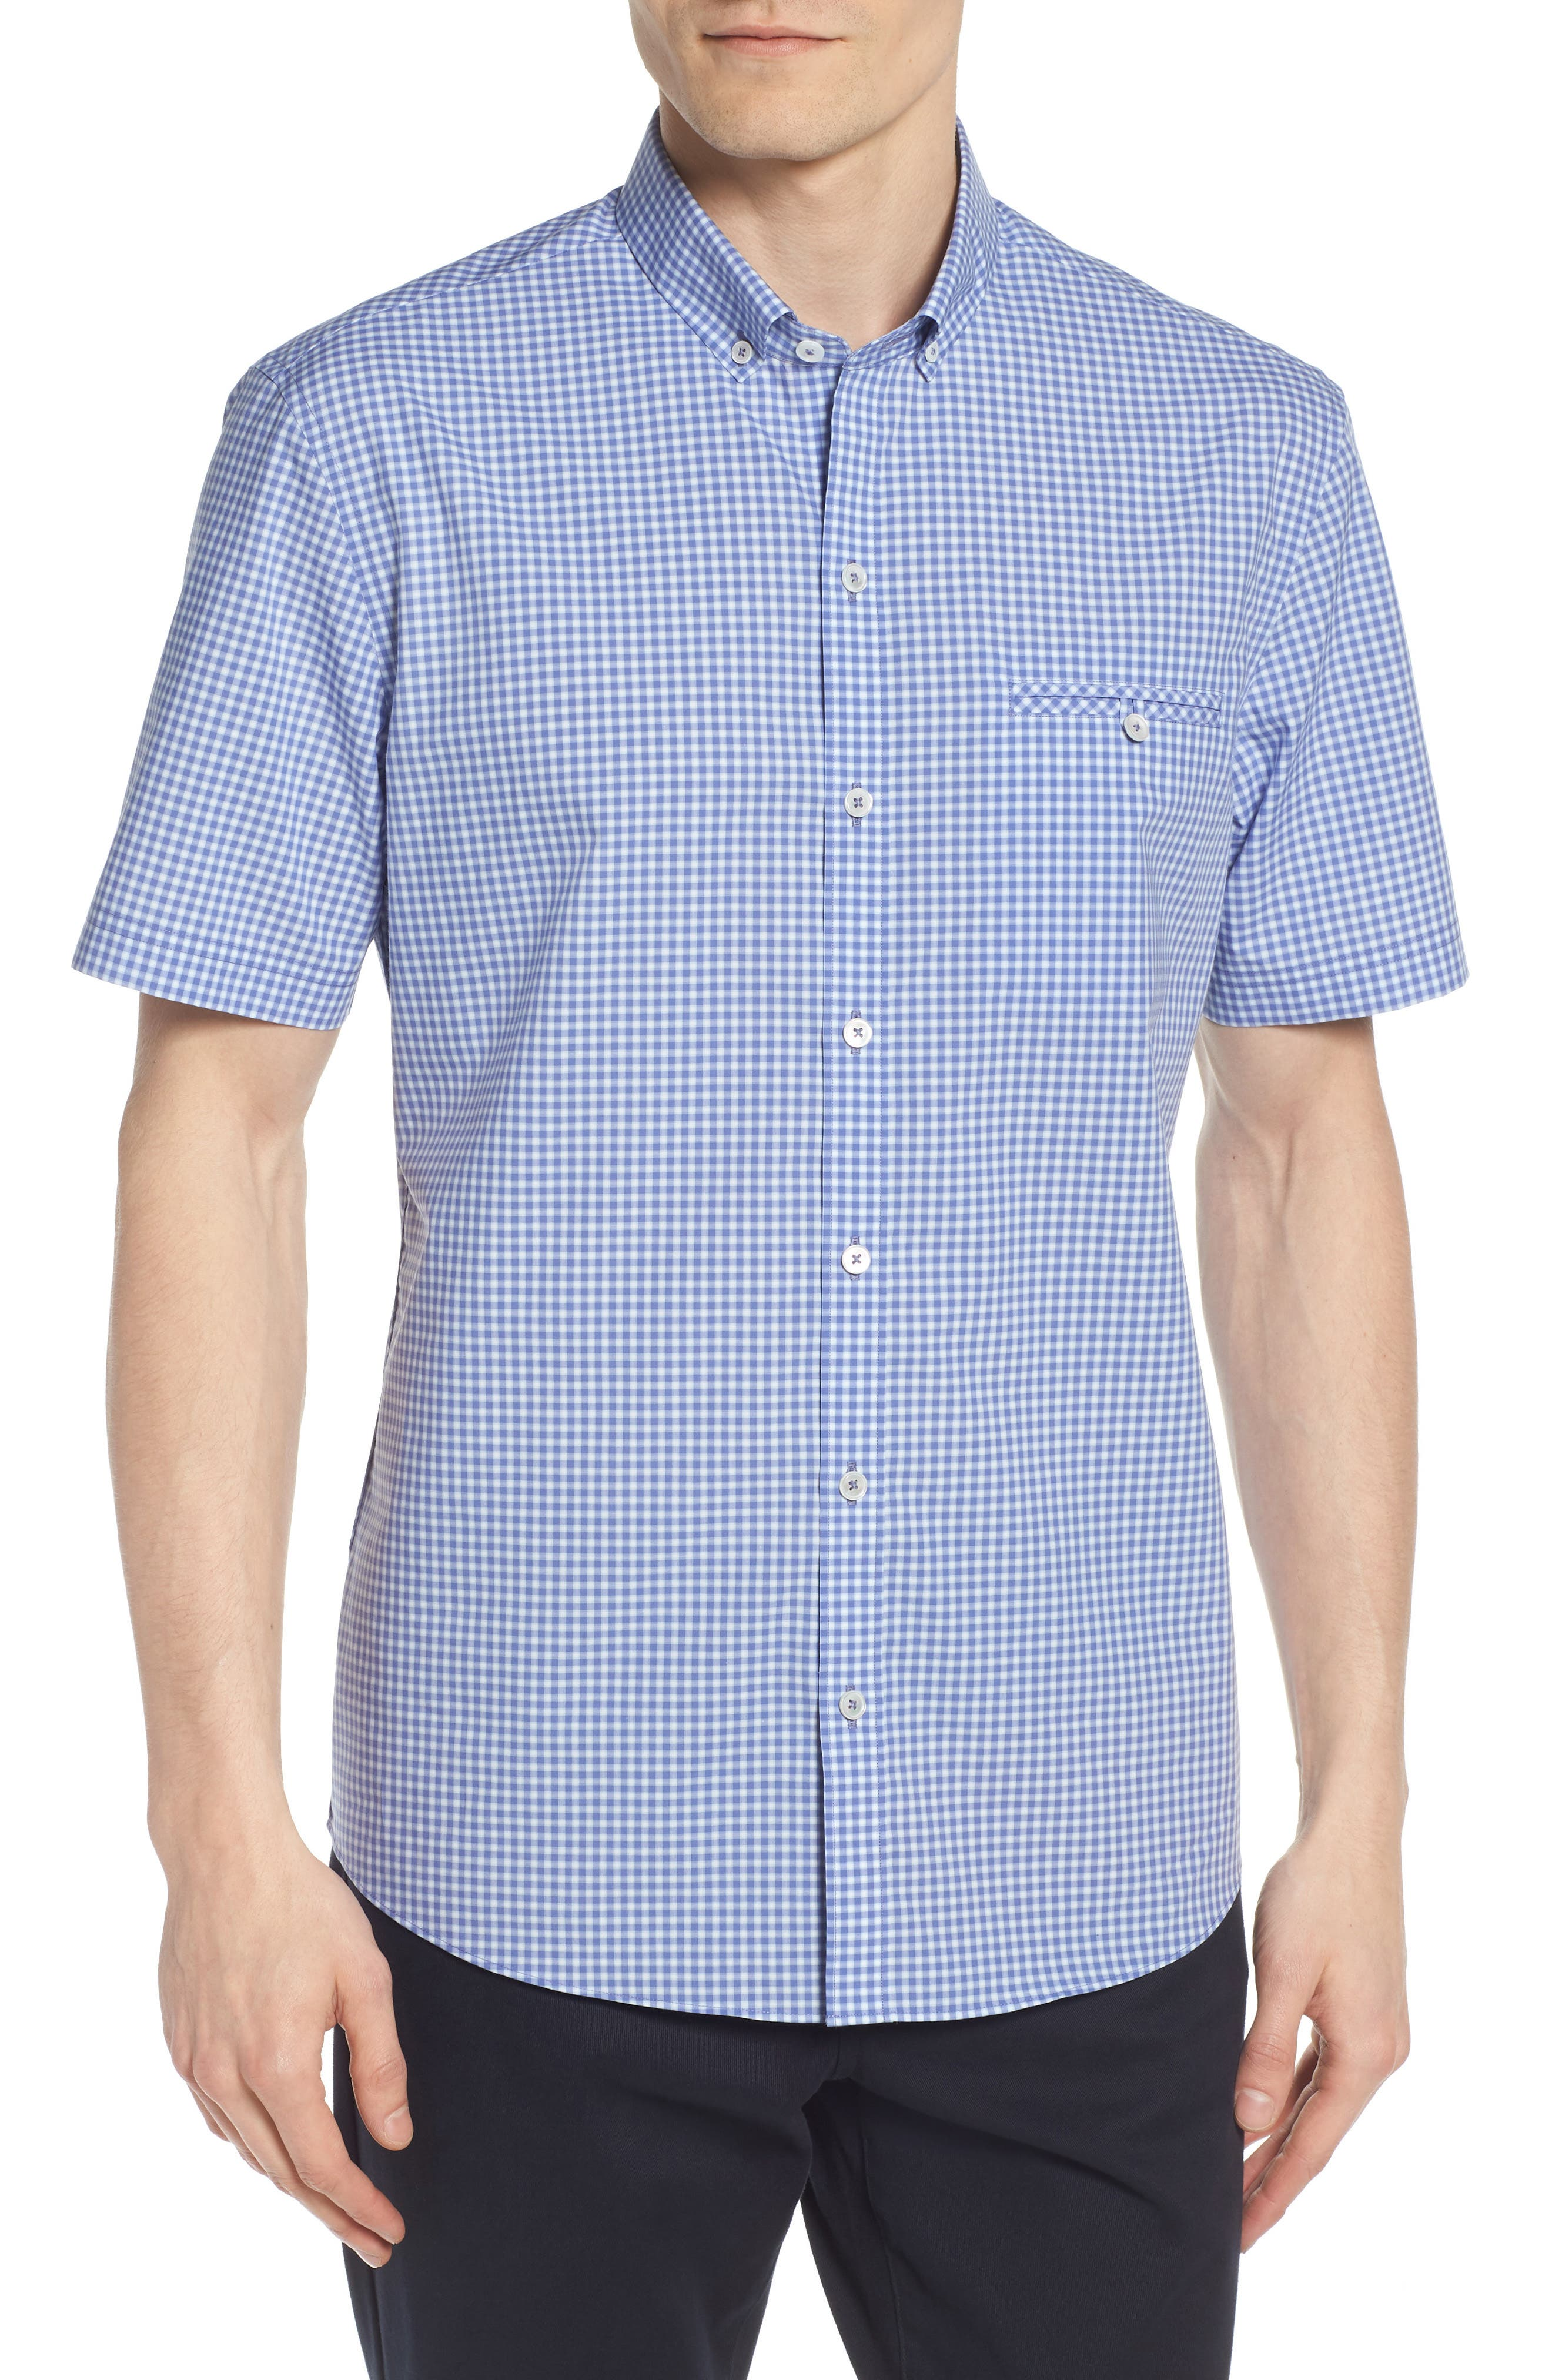 Giovinco Plaid Sport Shirt,                             Main thumbnail 1, color,                             422